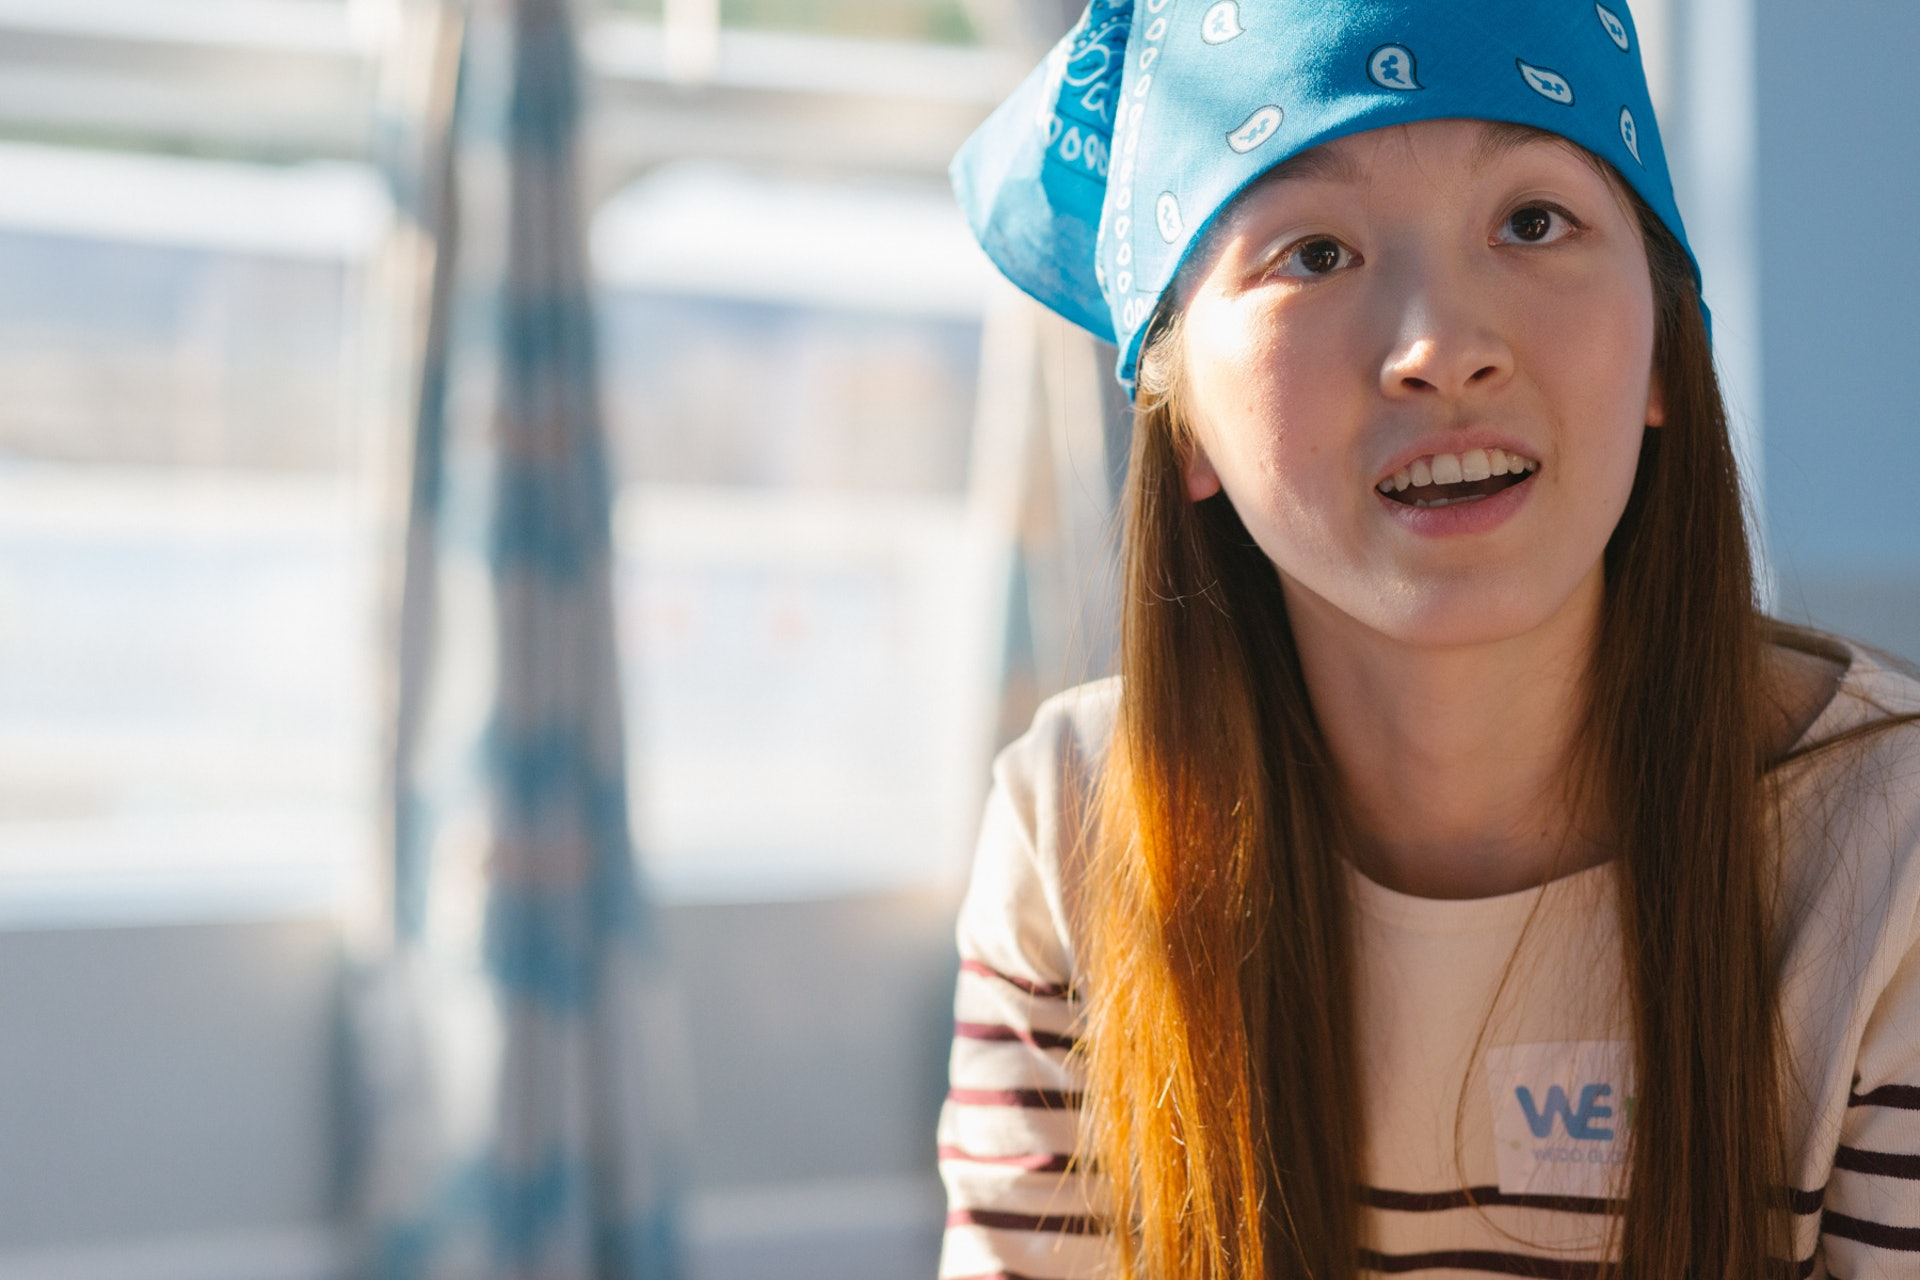 Eva希望透過WEDO GLOBAL令彼此做到文化交流,不只是本地人學習少數族裔文化,相對地少數族裔亦會學習中國傳統文化。(陳嘉元攝)